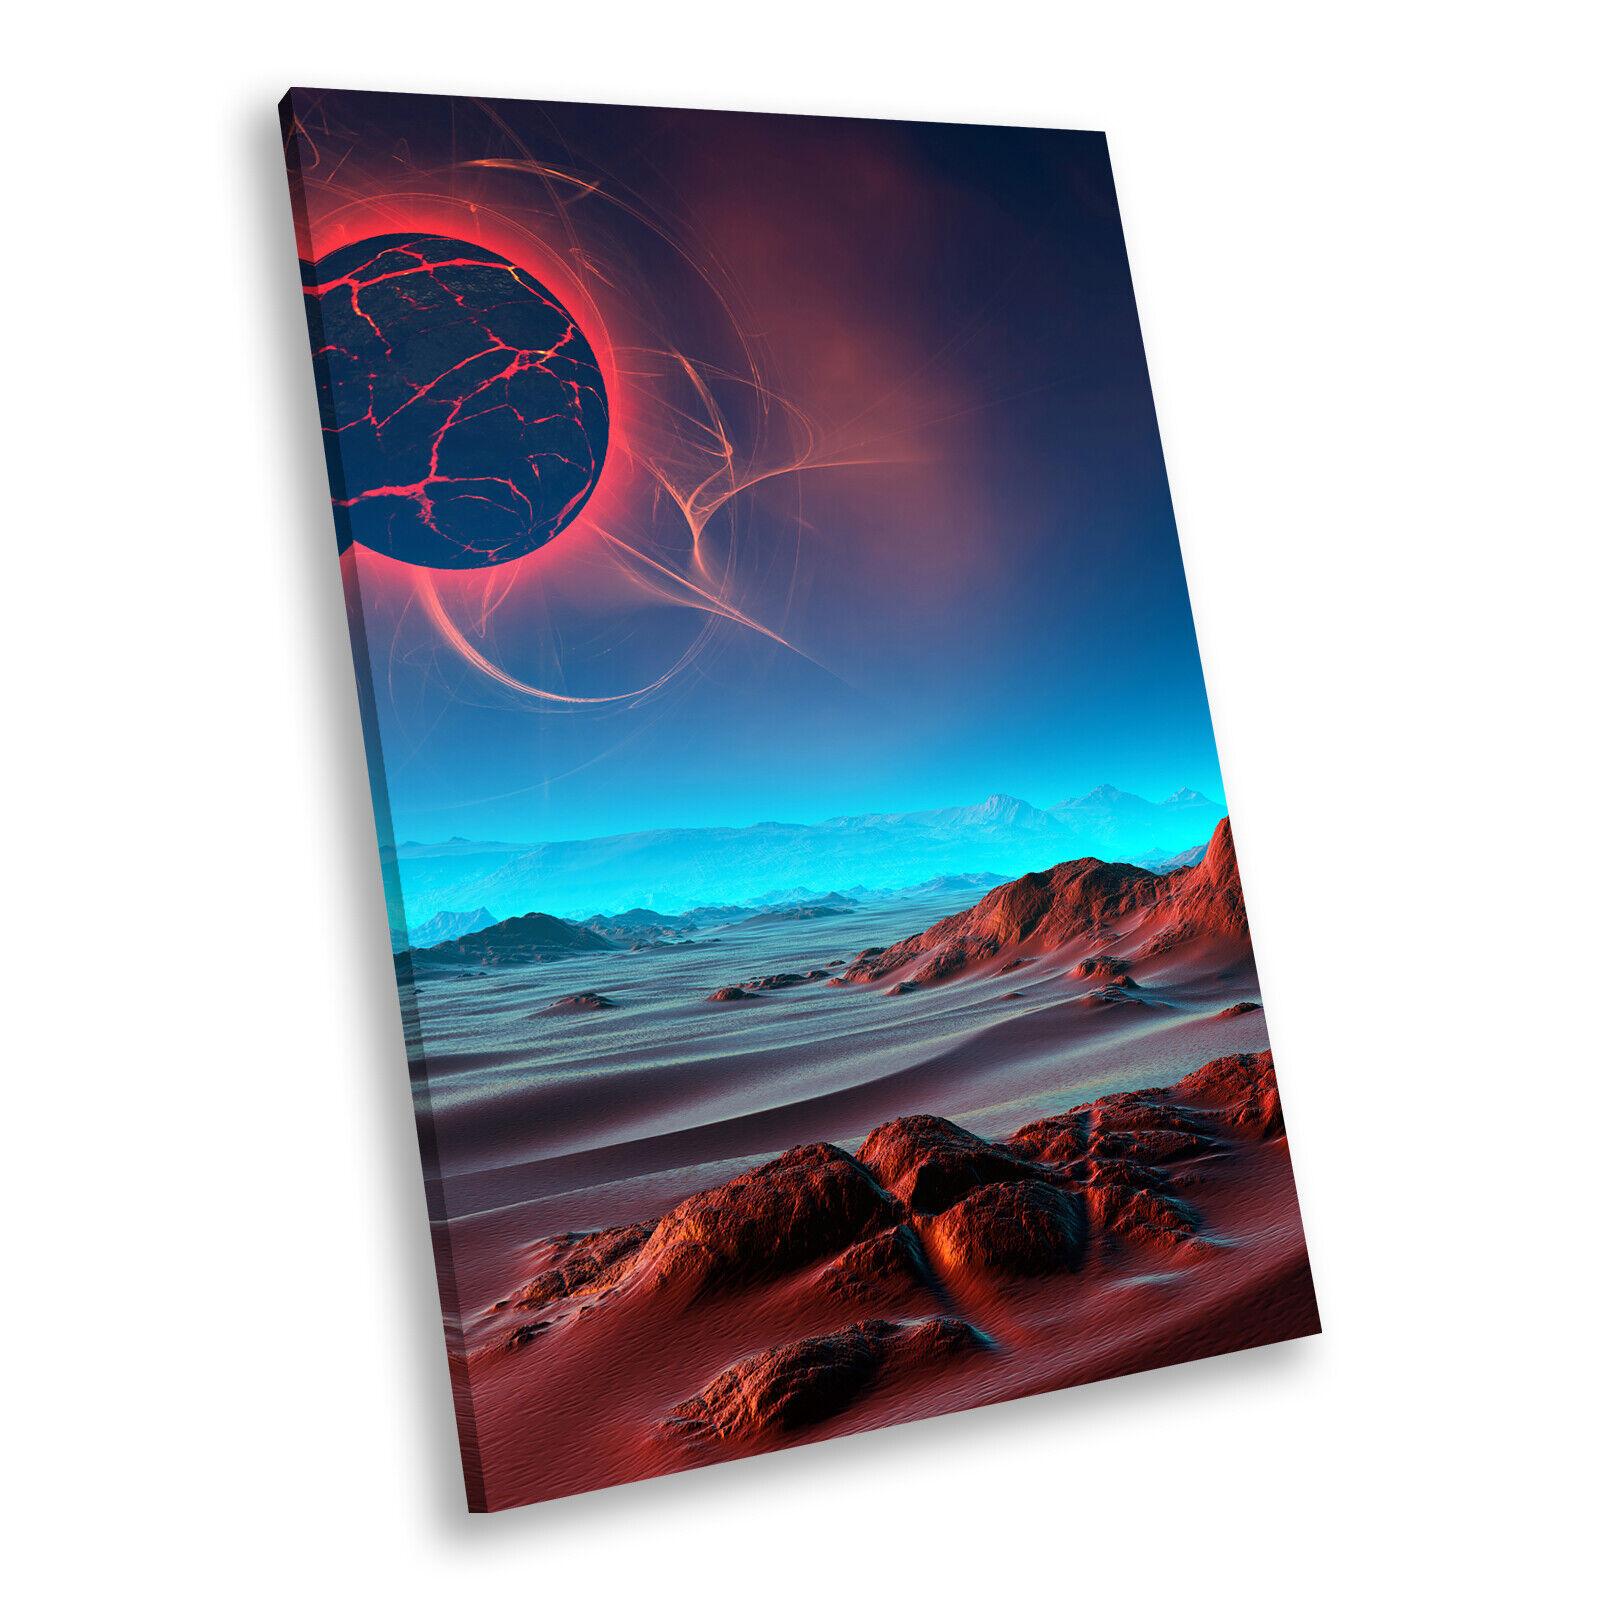 Blau rot Sci Fi Planet Cool Portrait Scenic Canvas Wall Art Large Picture Prints